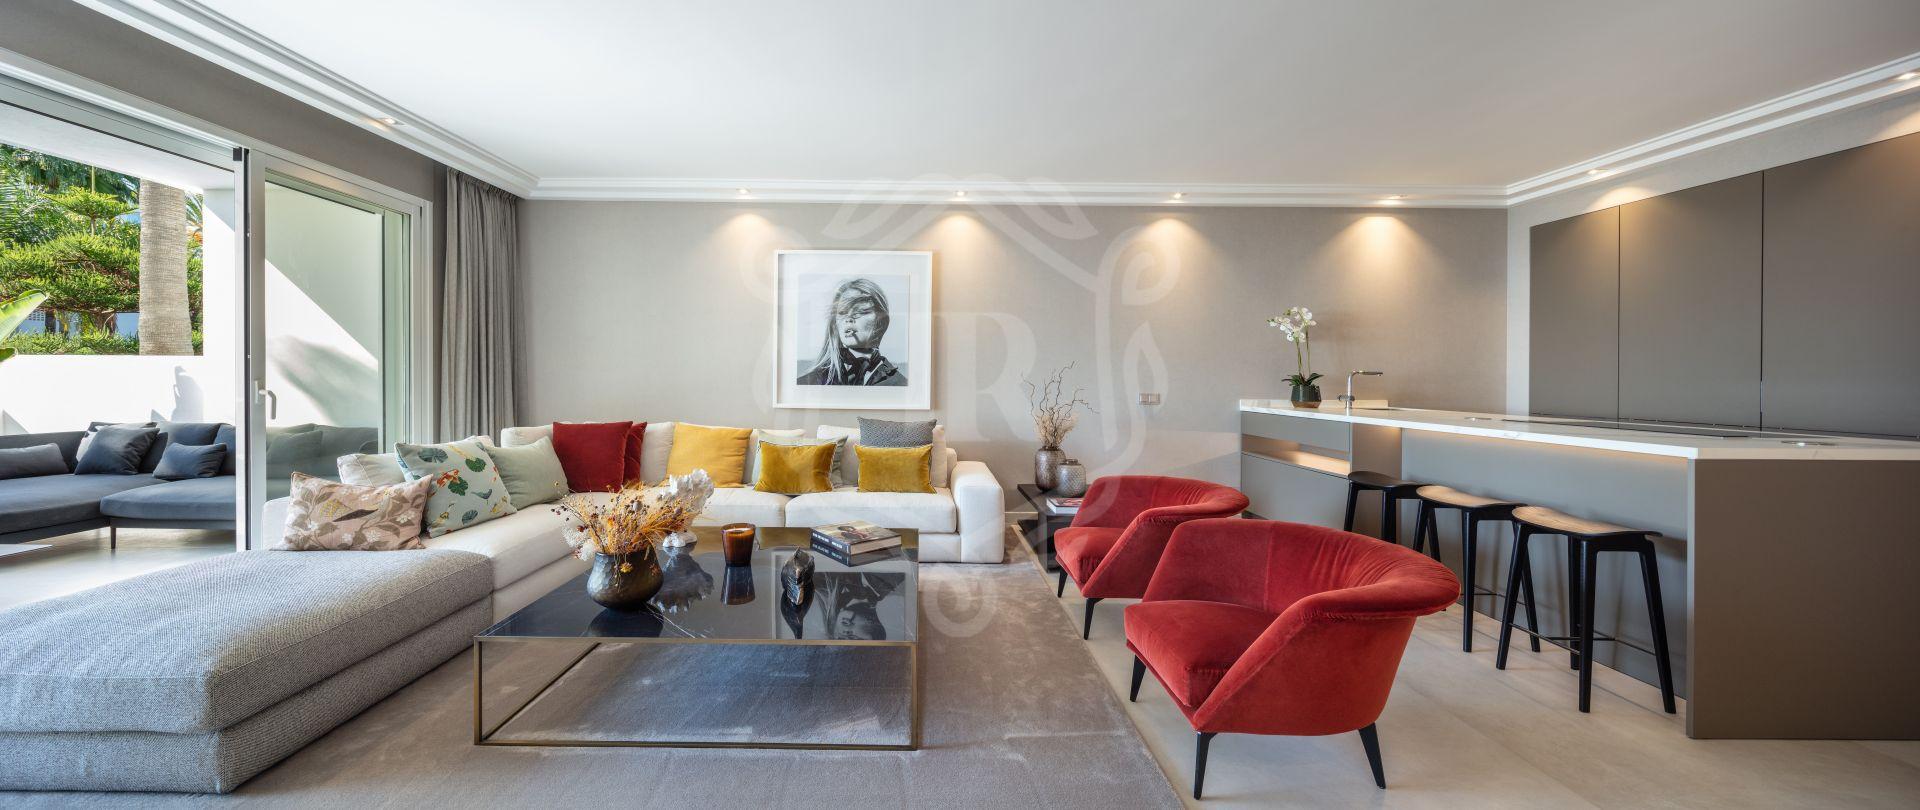 Ground Floor Apartment for sale in Puente Romano, Marbella Golden Mile